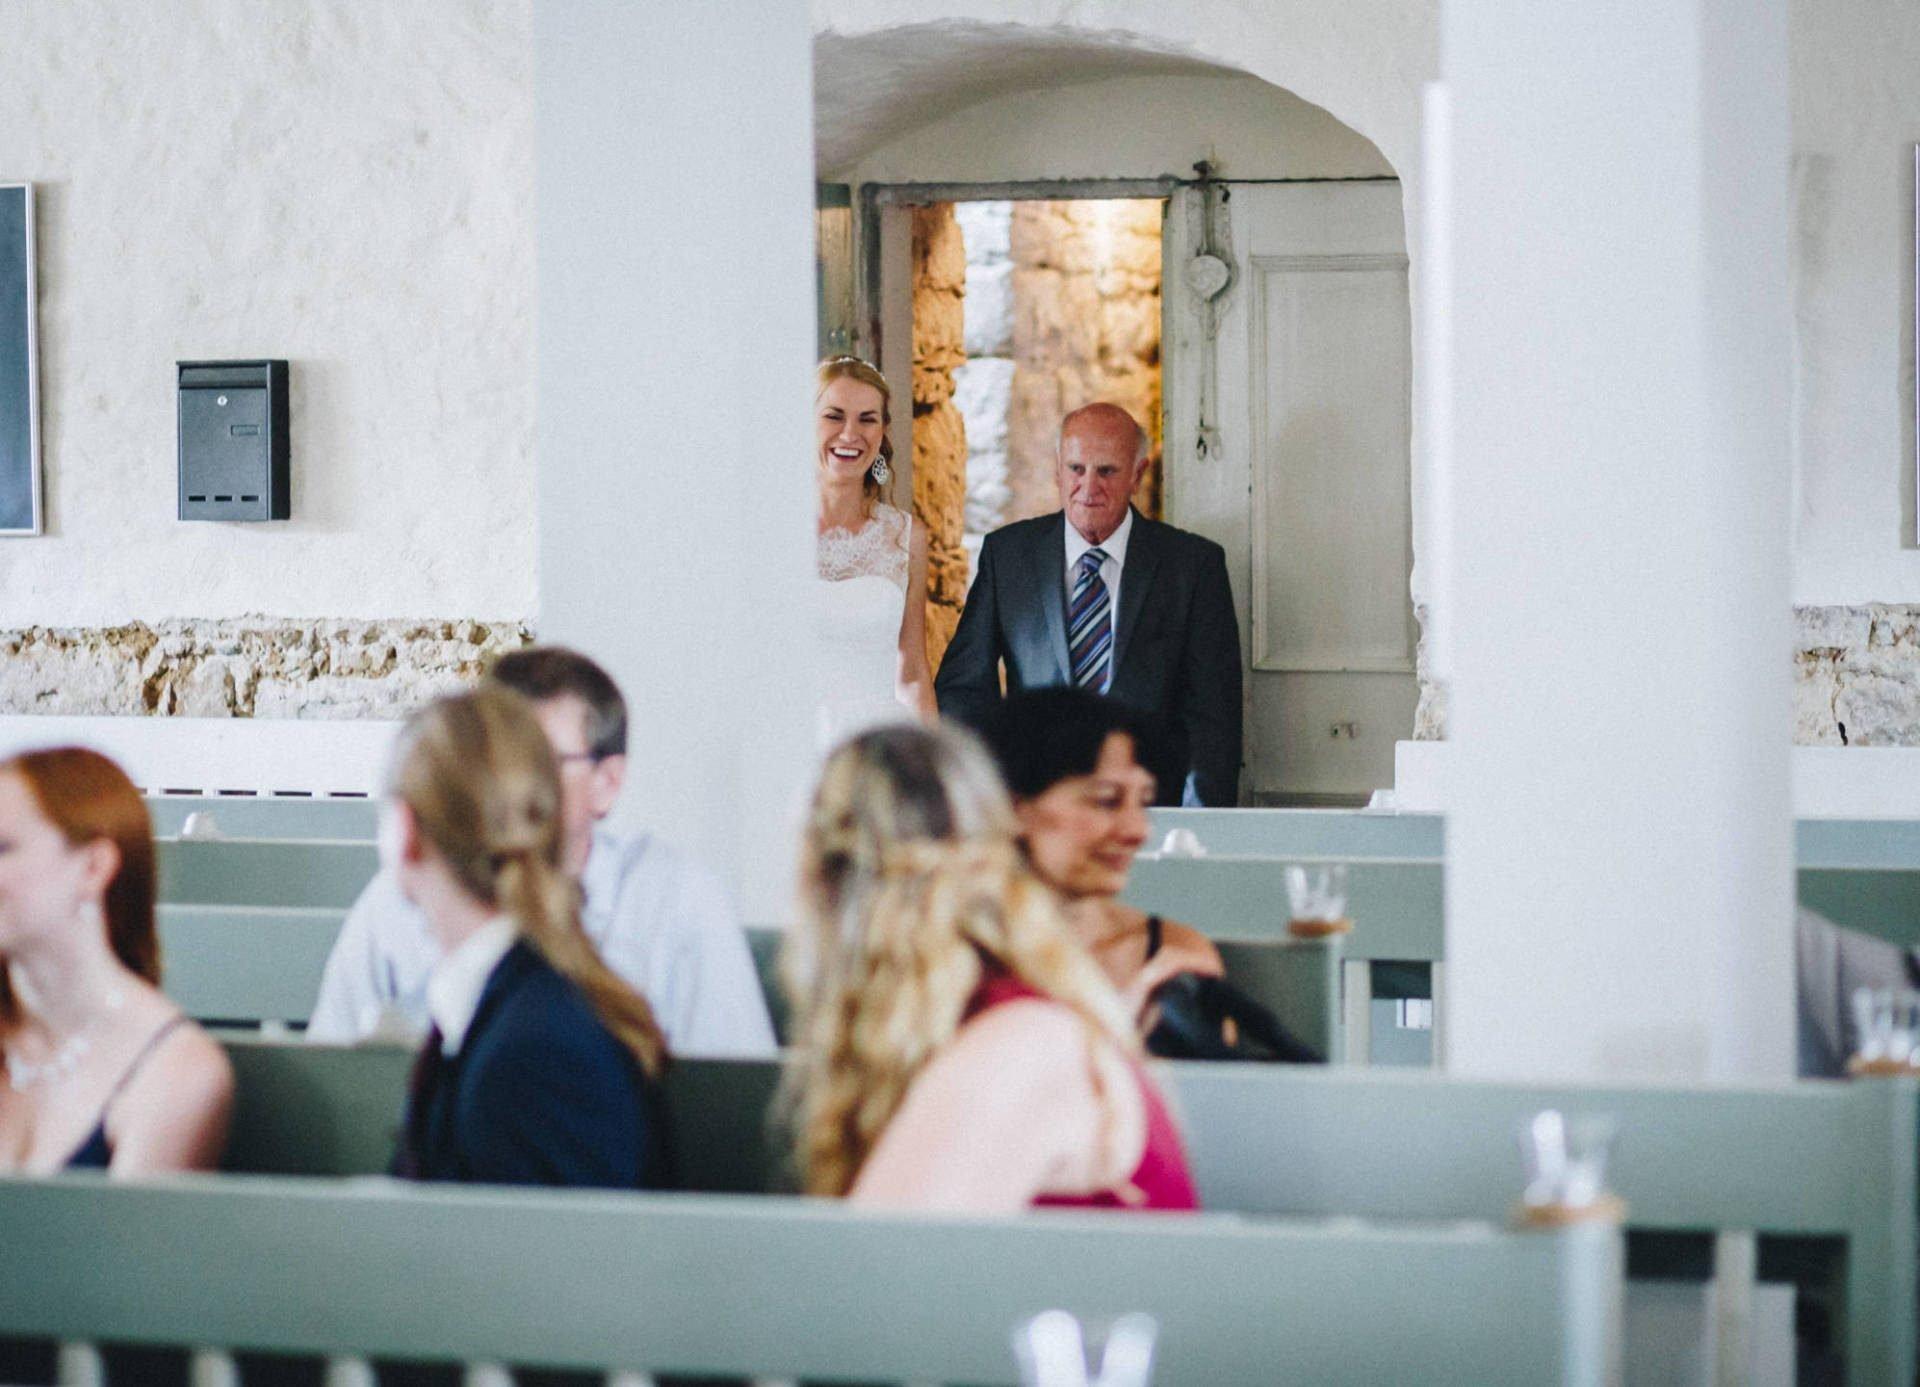 JuleSascha 01 1920x1387 - Hochzeit im alten Dornburger Schloss